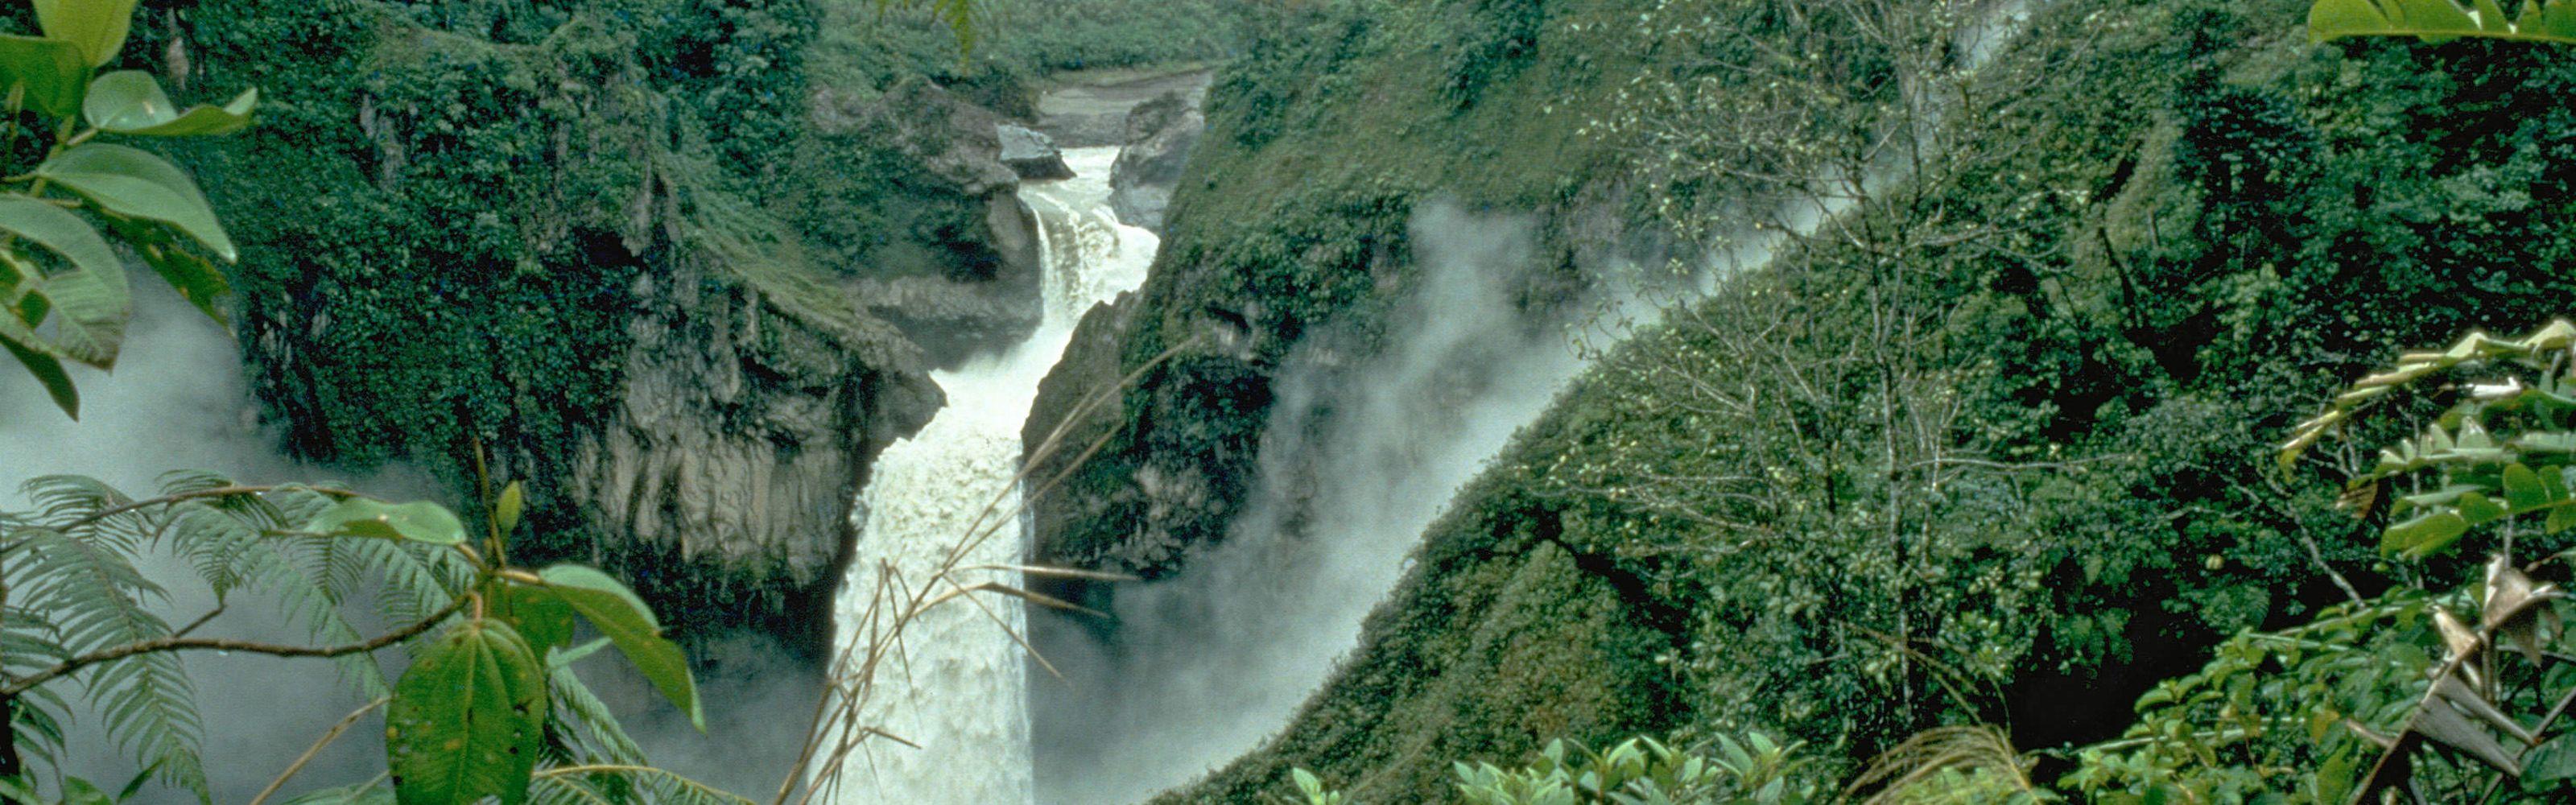 Cascada San Rafael en la Reserva Ecológica Cayambe-Coca en Ecuador